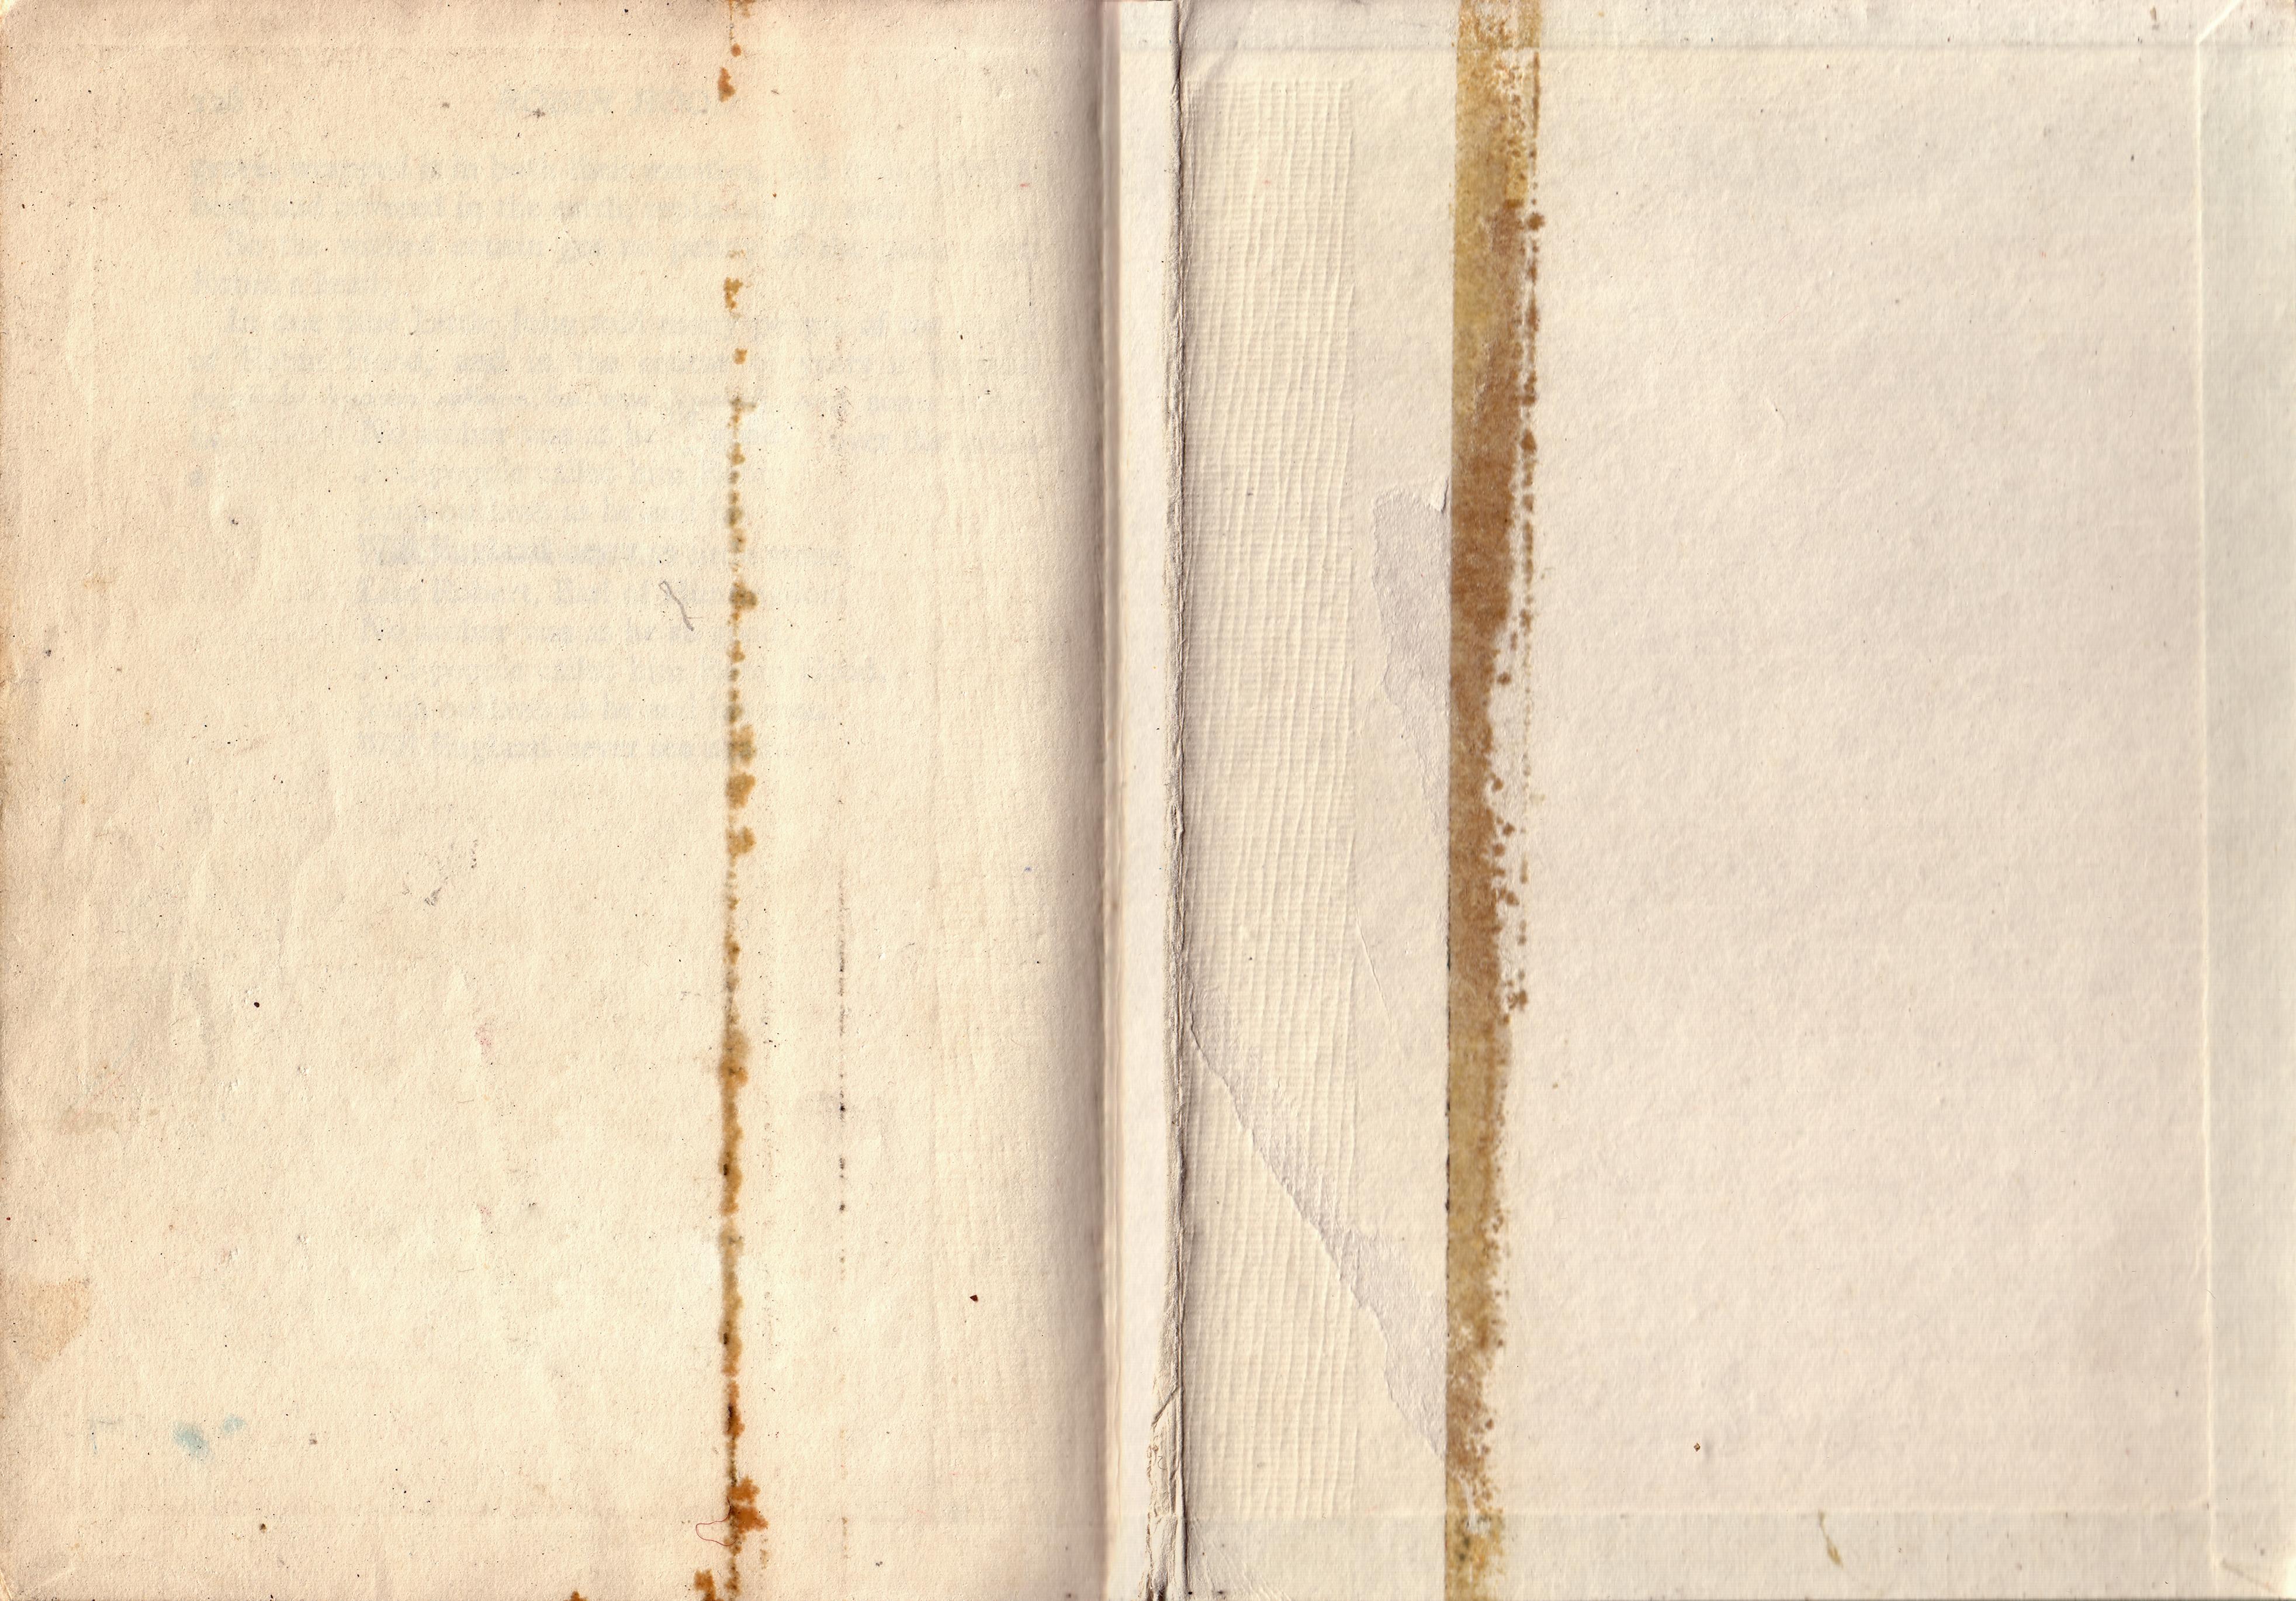 Untitled Texture CCCVII